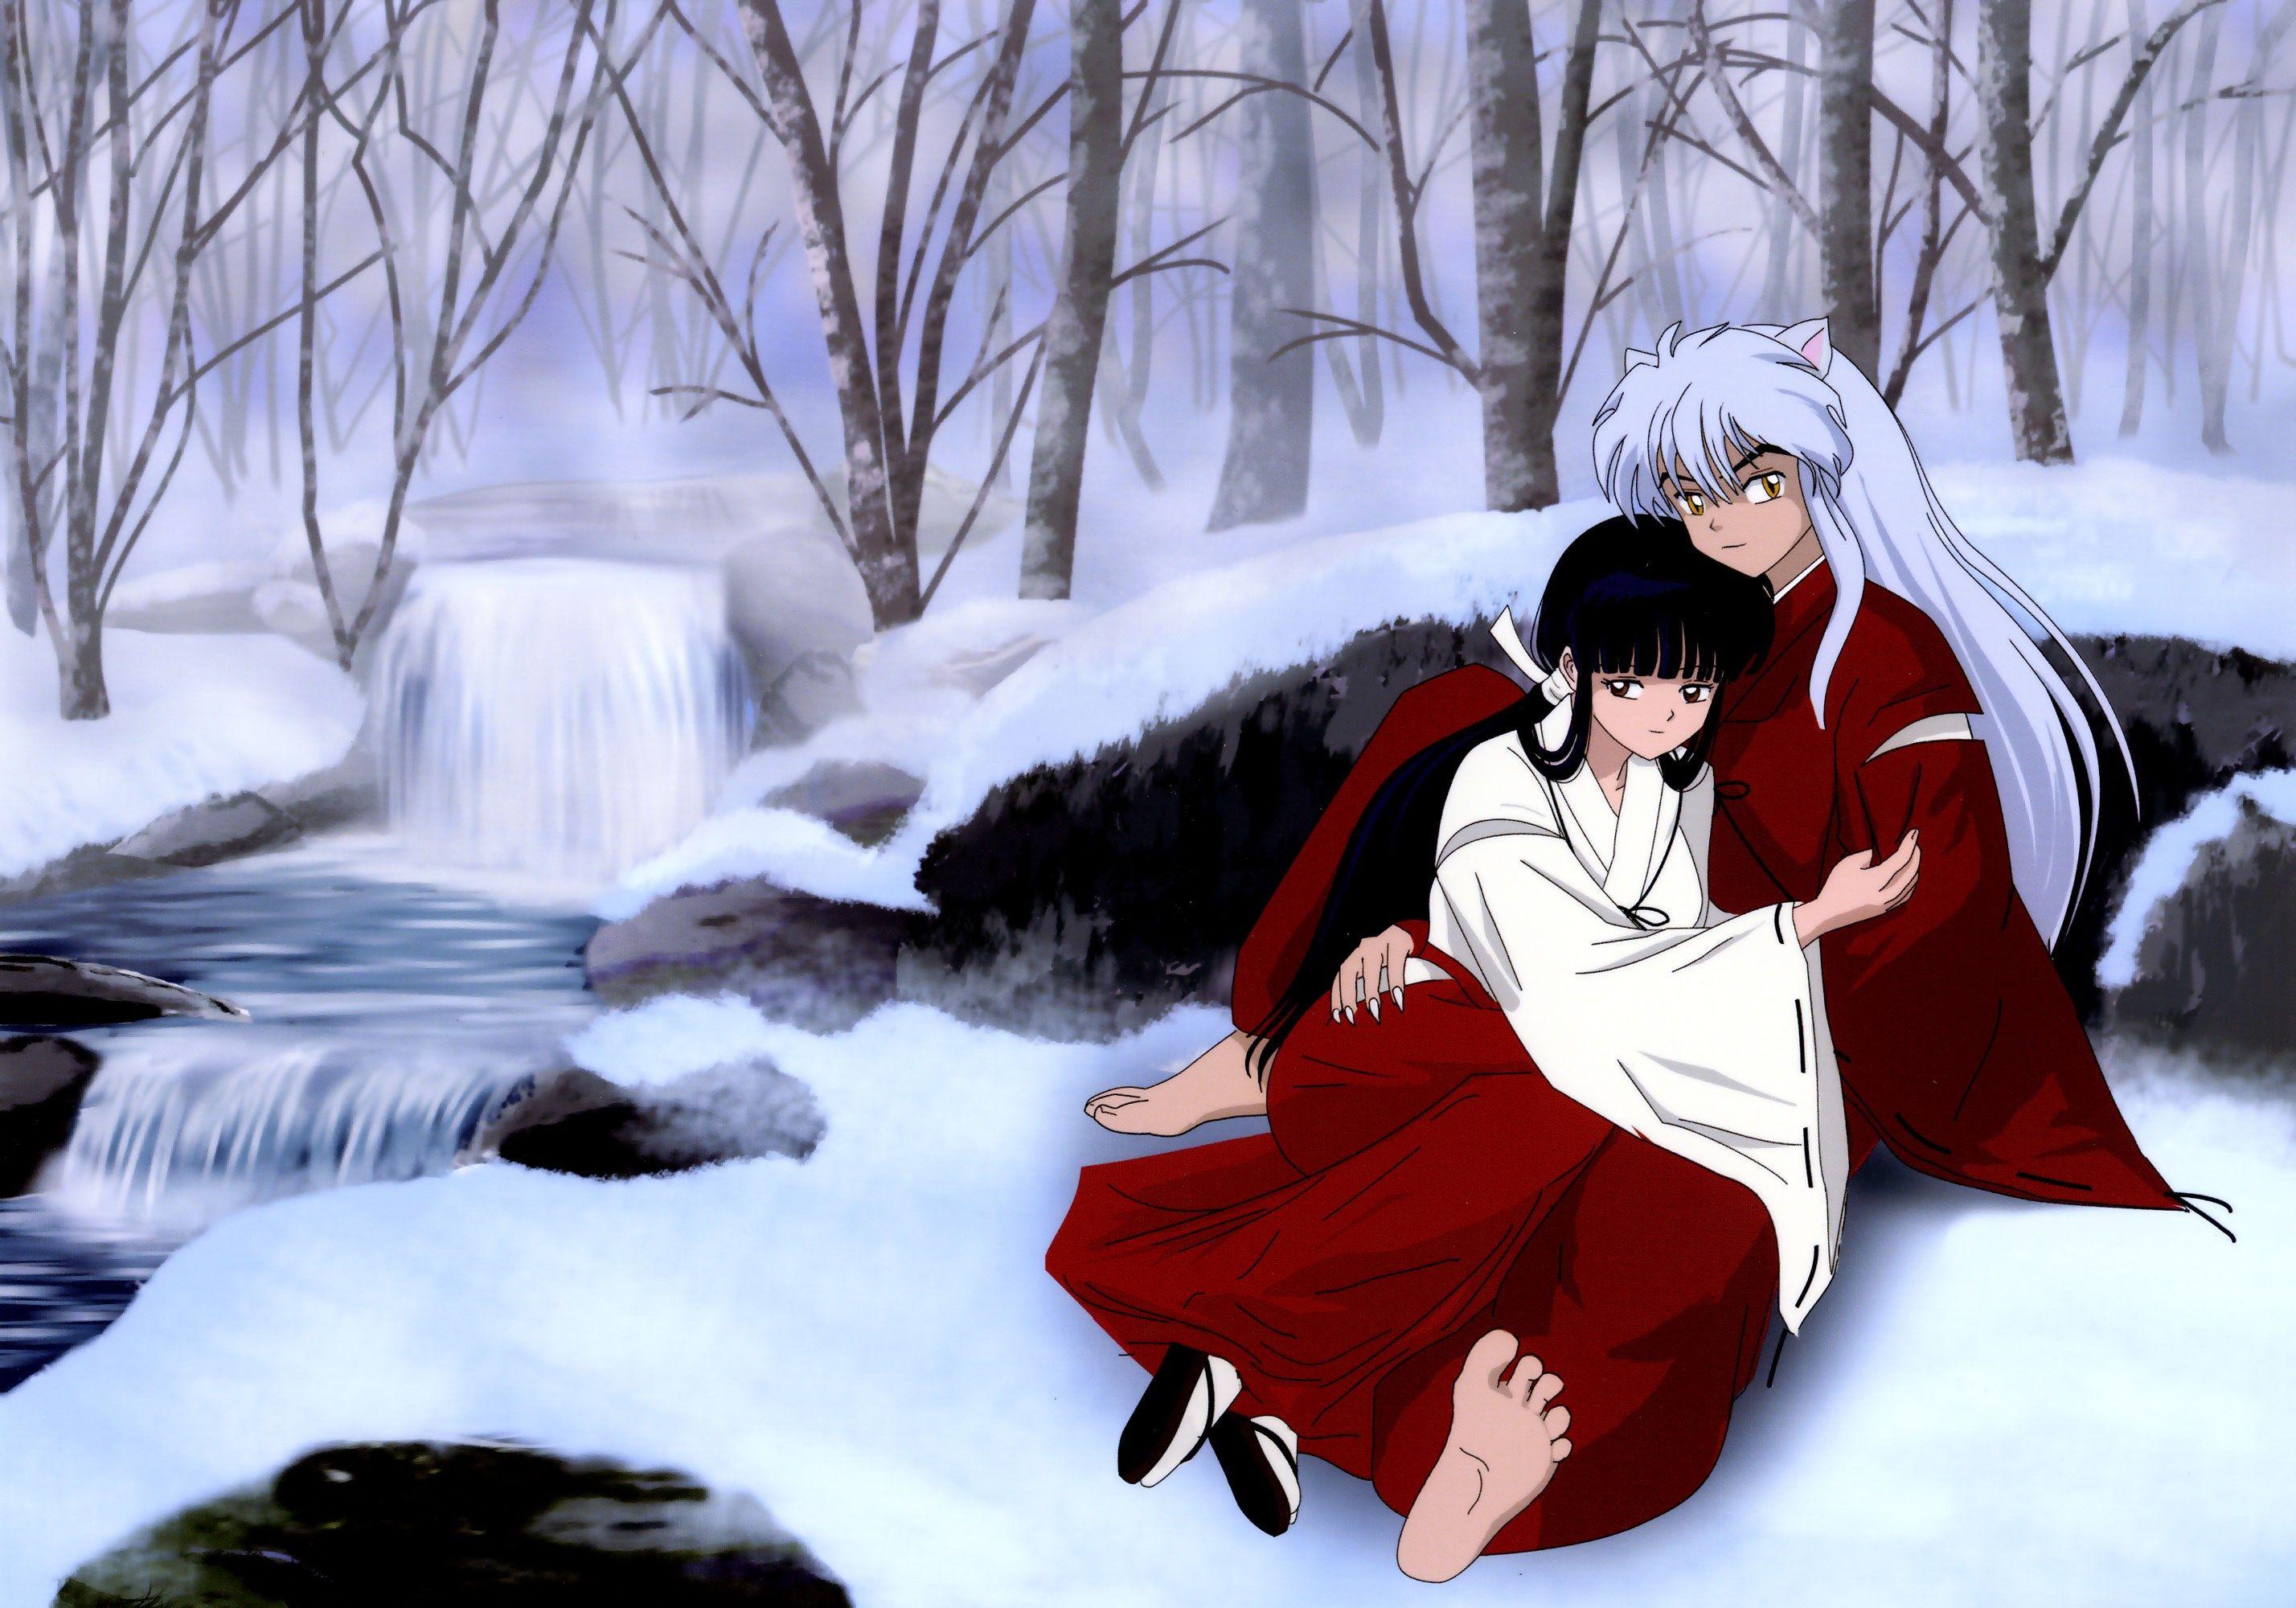 Intimate Kikyo Inuyasha Anime Full Hd Wallpaper Inuyasha And Kikyo Inuyasha Anime